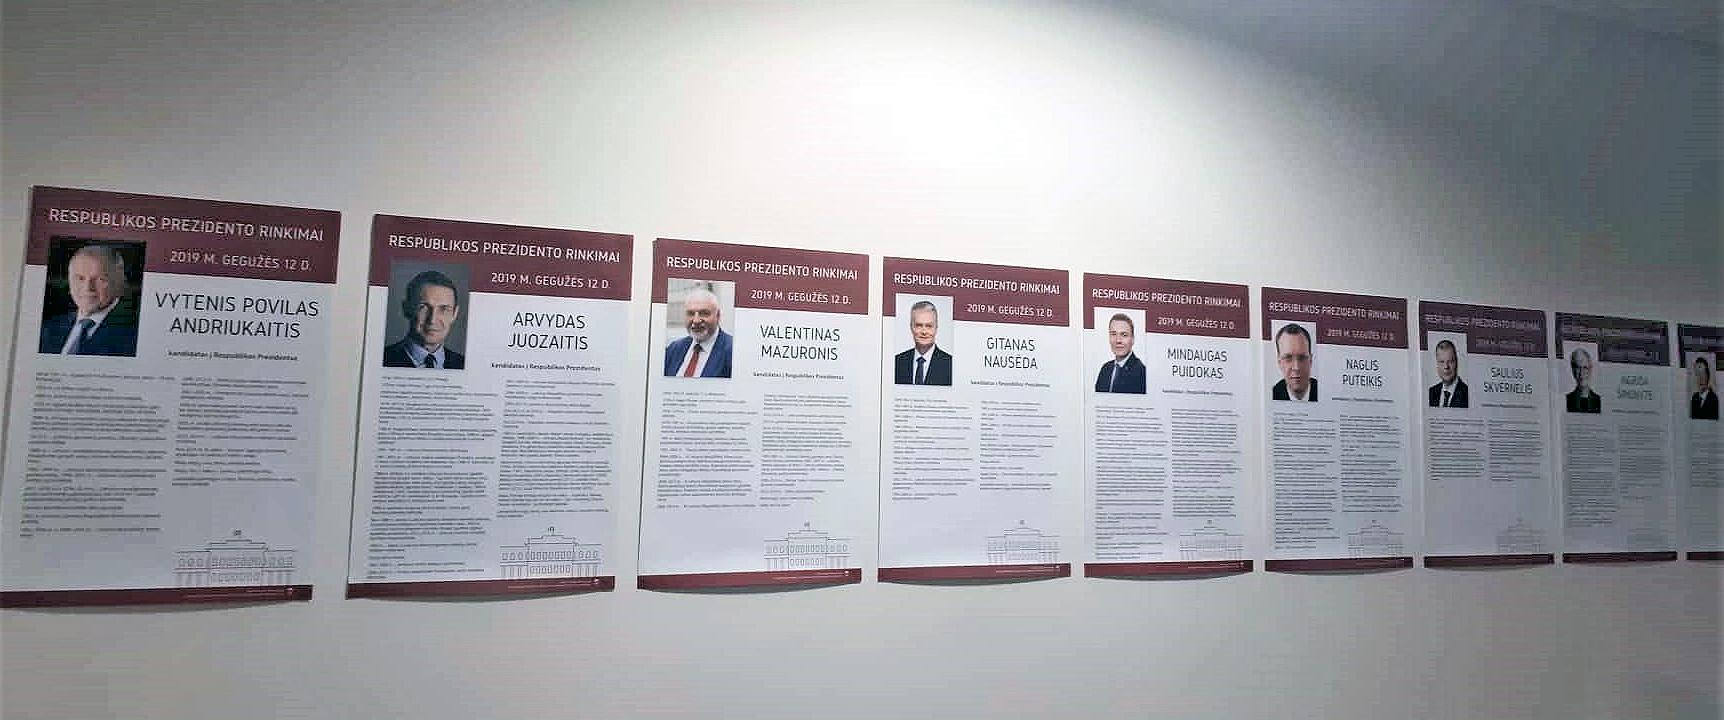 Prezidento rinkimai 2019-05-12 | Alkas.lt nuotr.